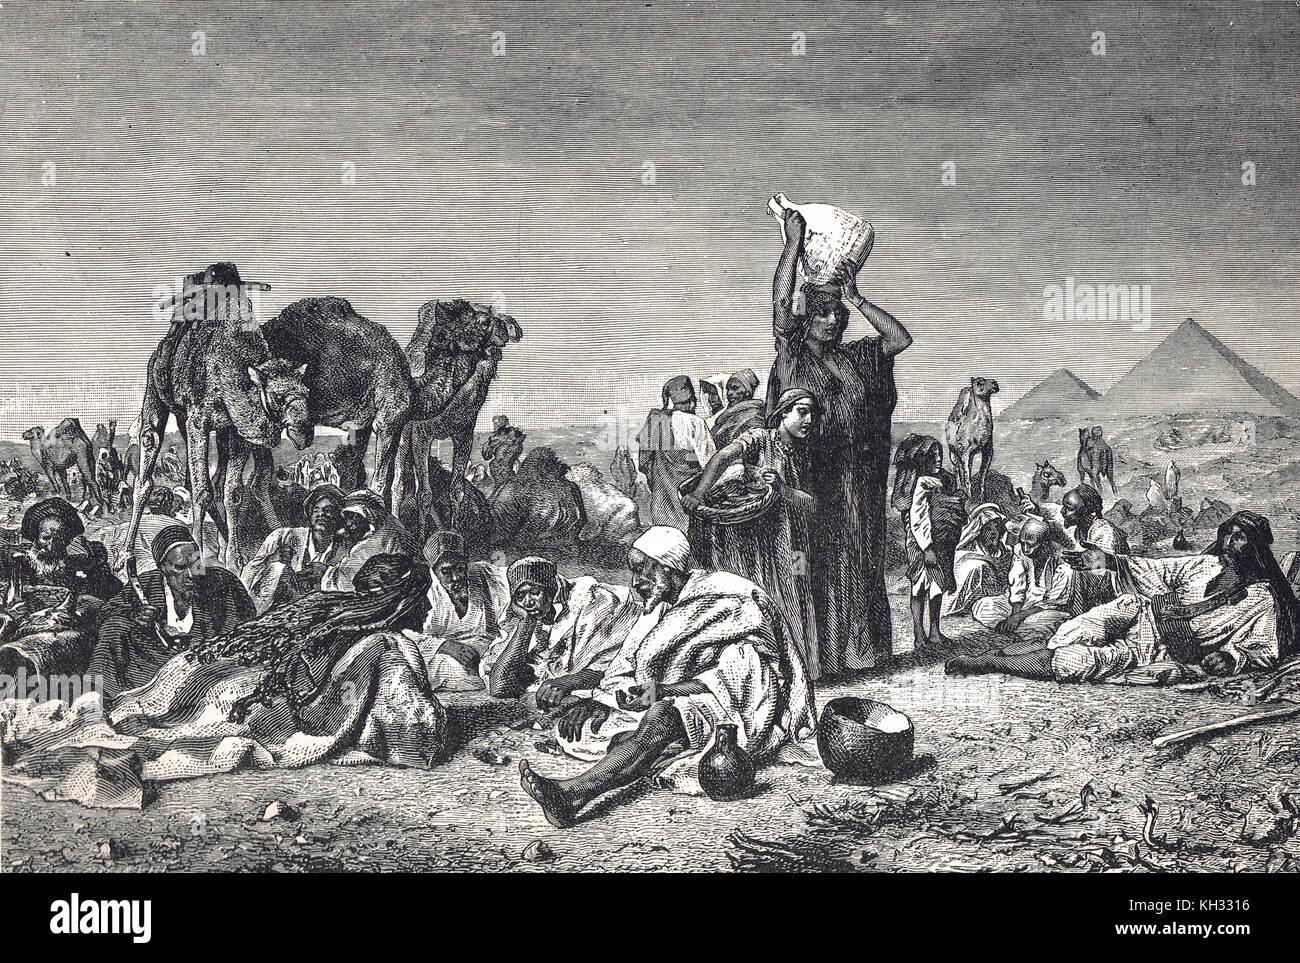 An Arab Bedouin camp desert scene, in the 19th century - Stock Image